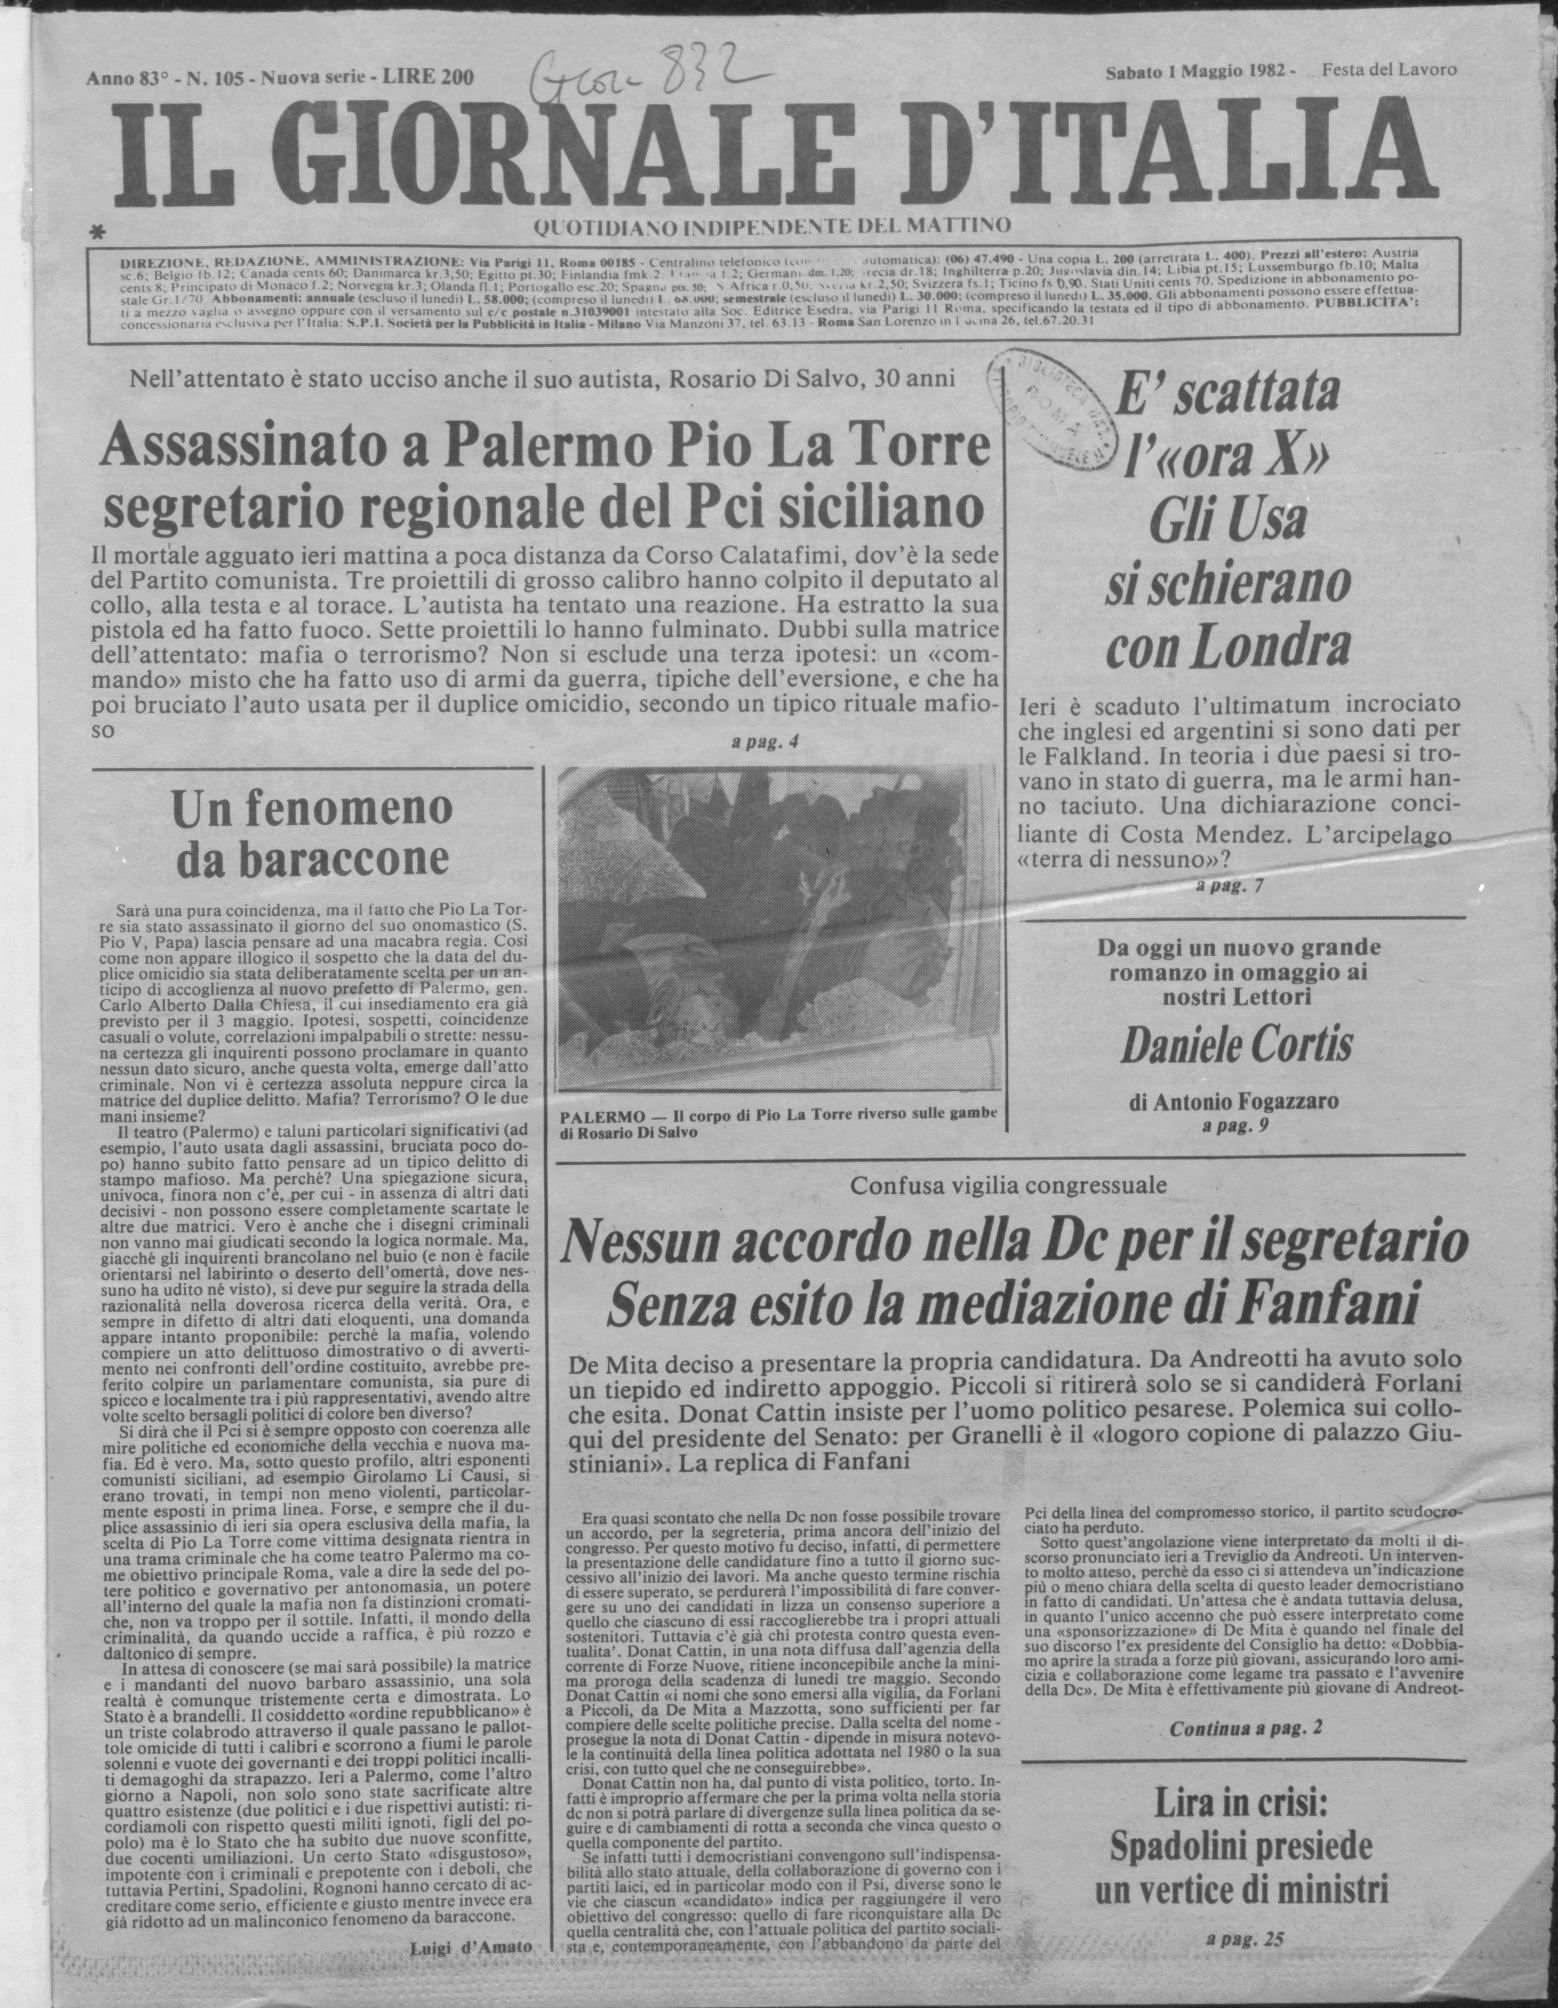 fig1-giornale-d-italia-01-05-1982-p-1_1418802425754-jpg